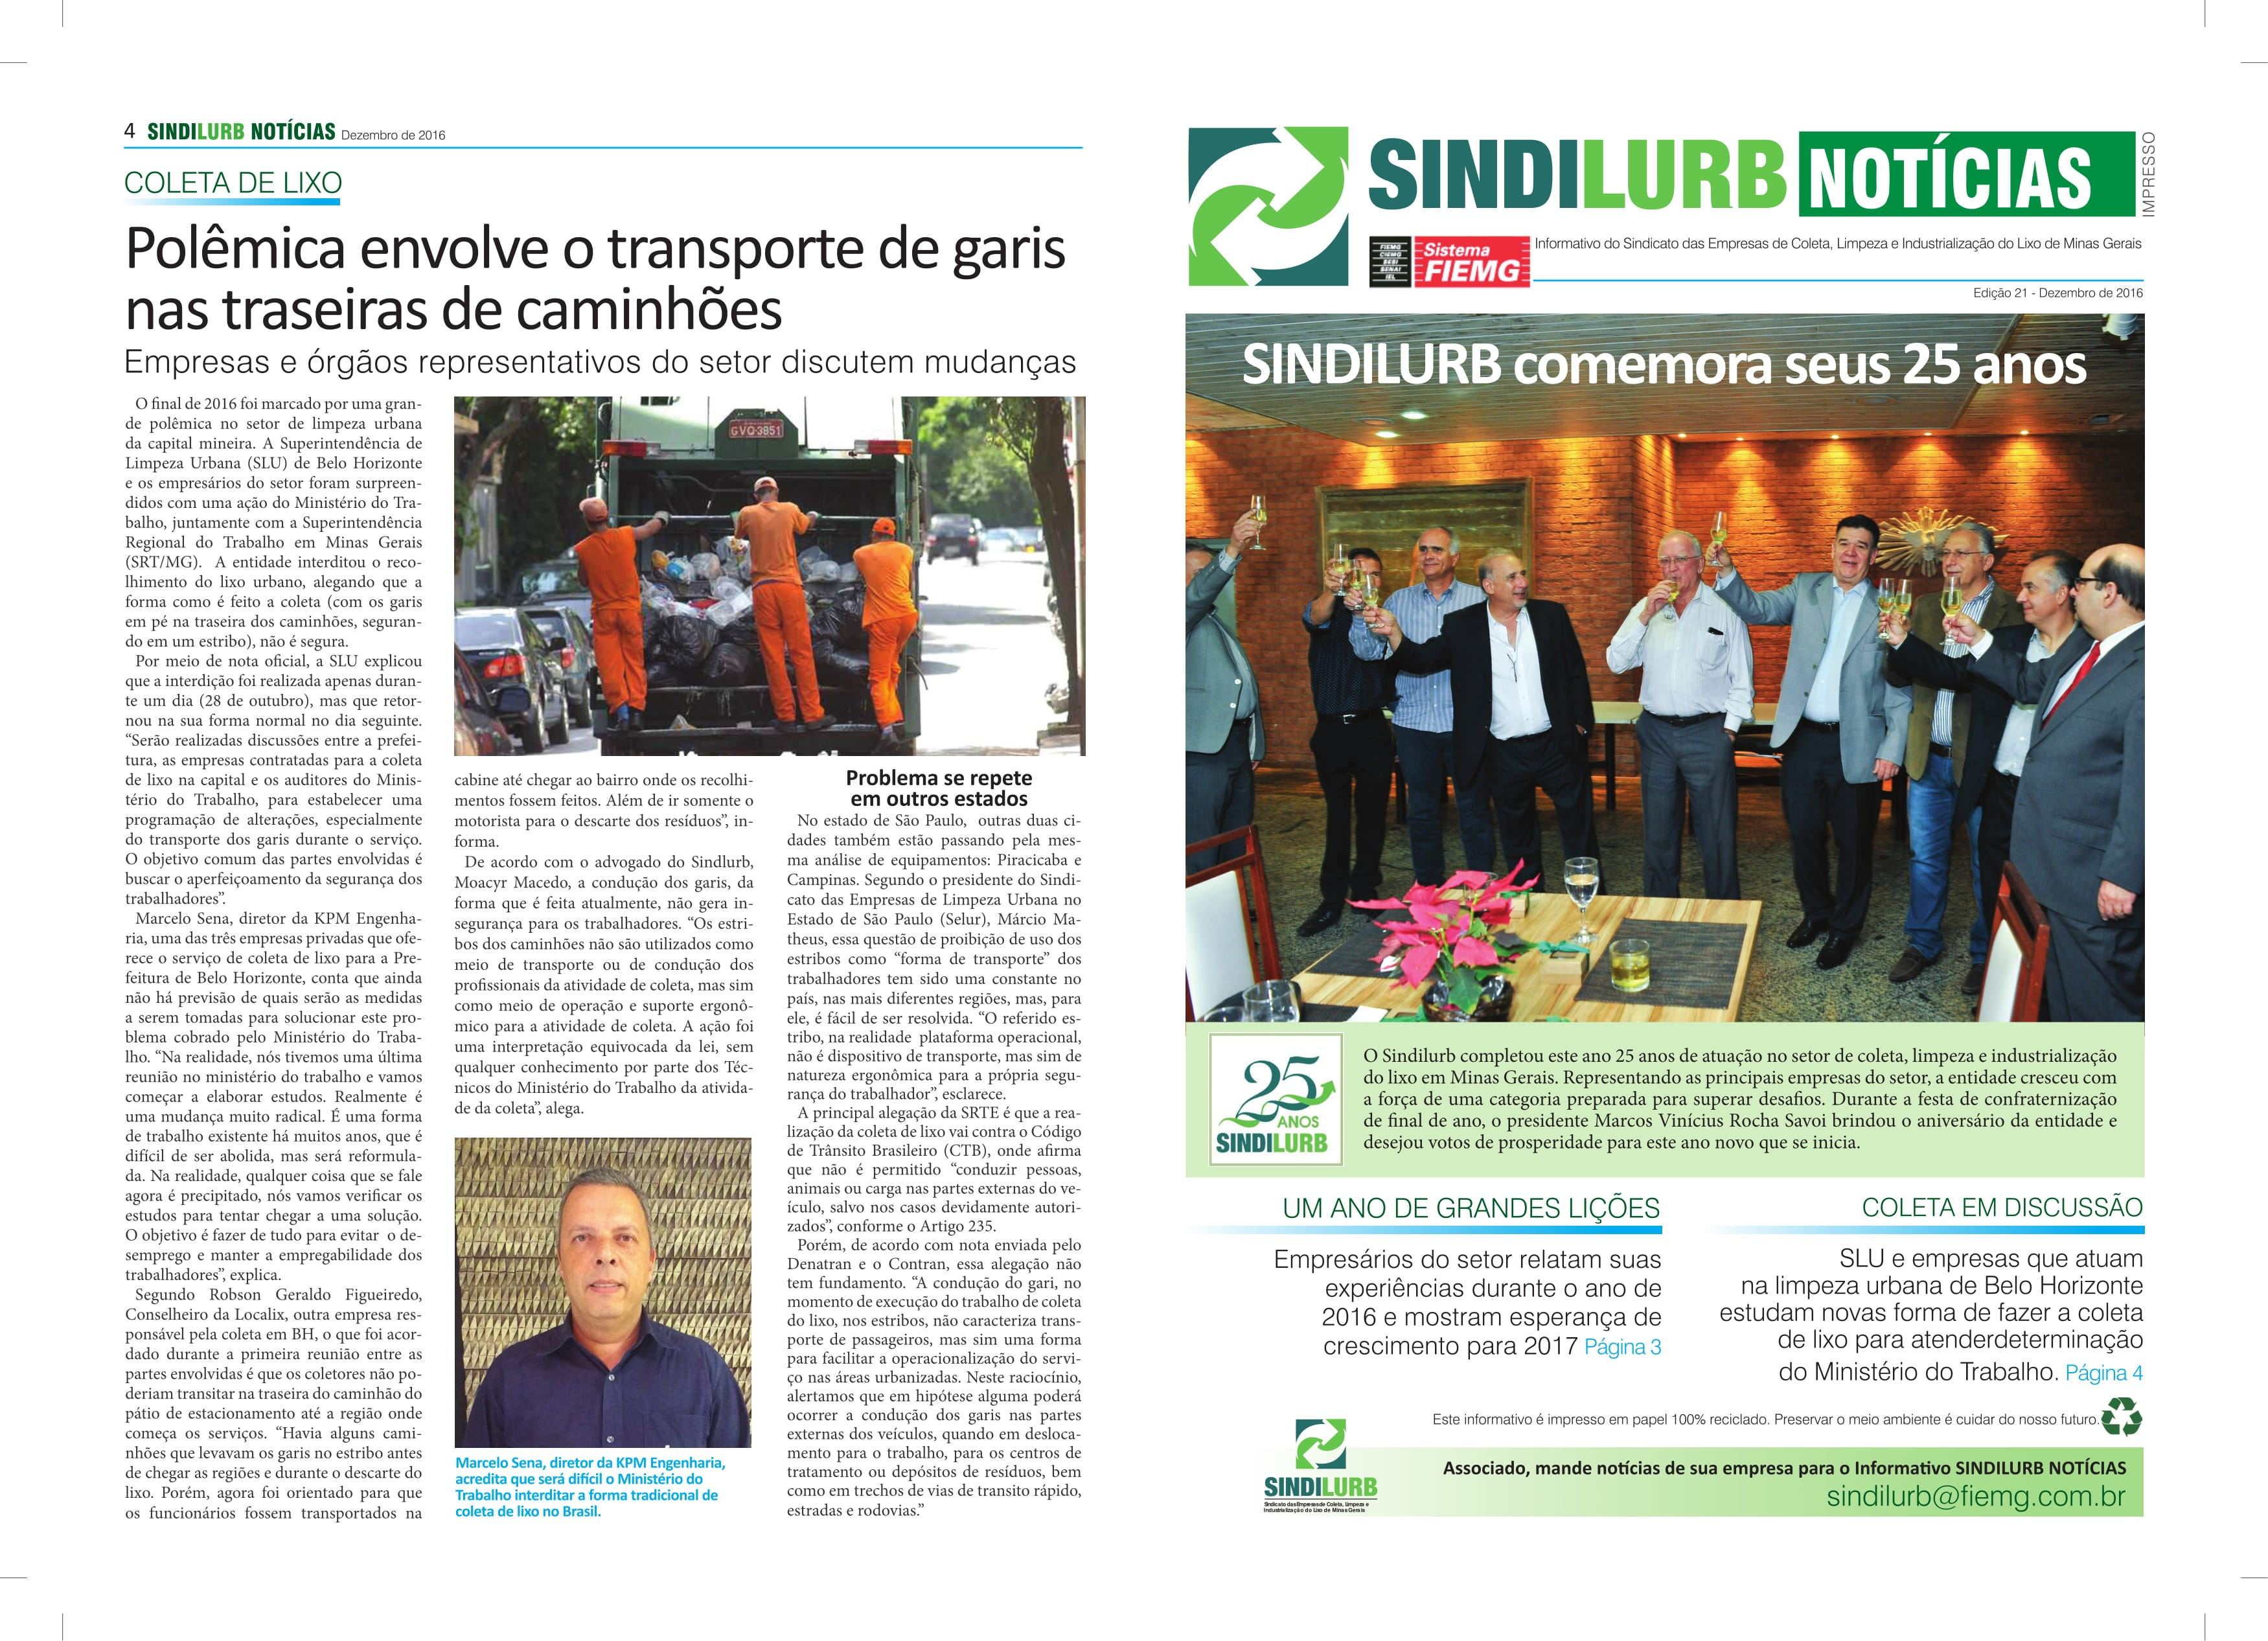 jornal sindilurb 21ª edição-1